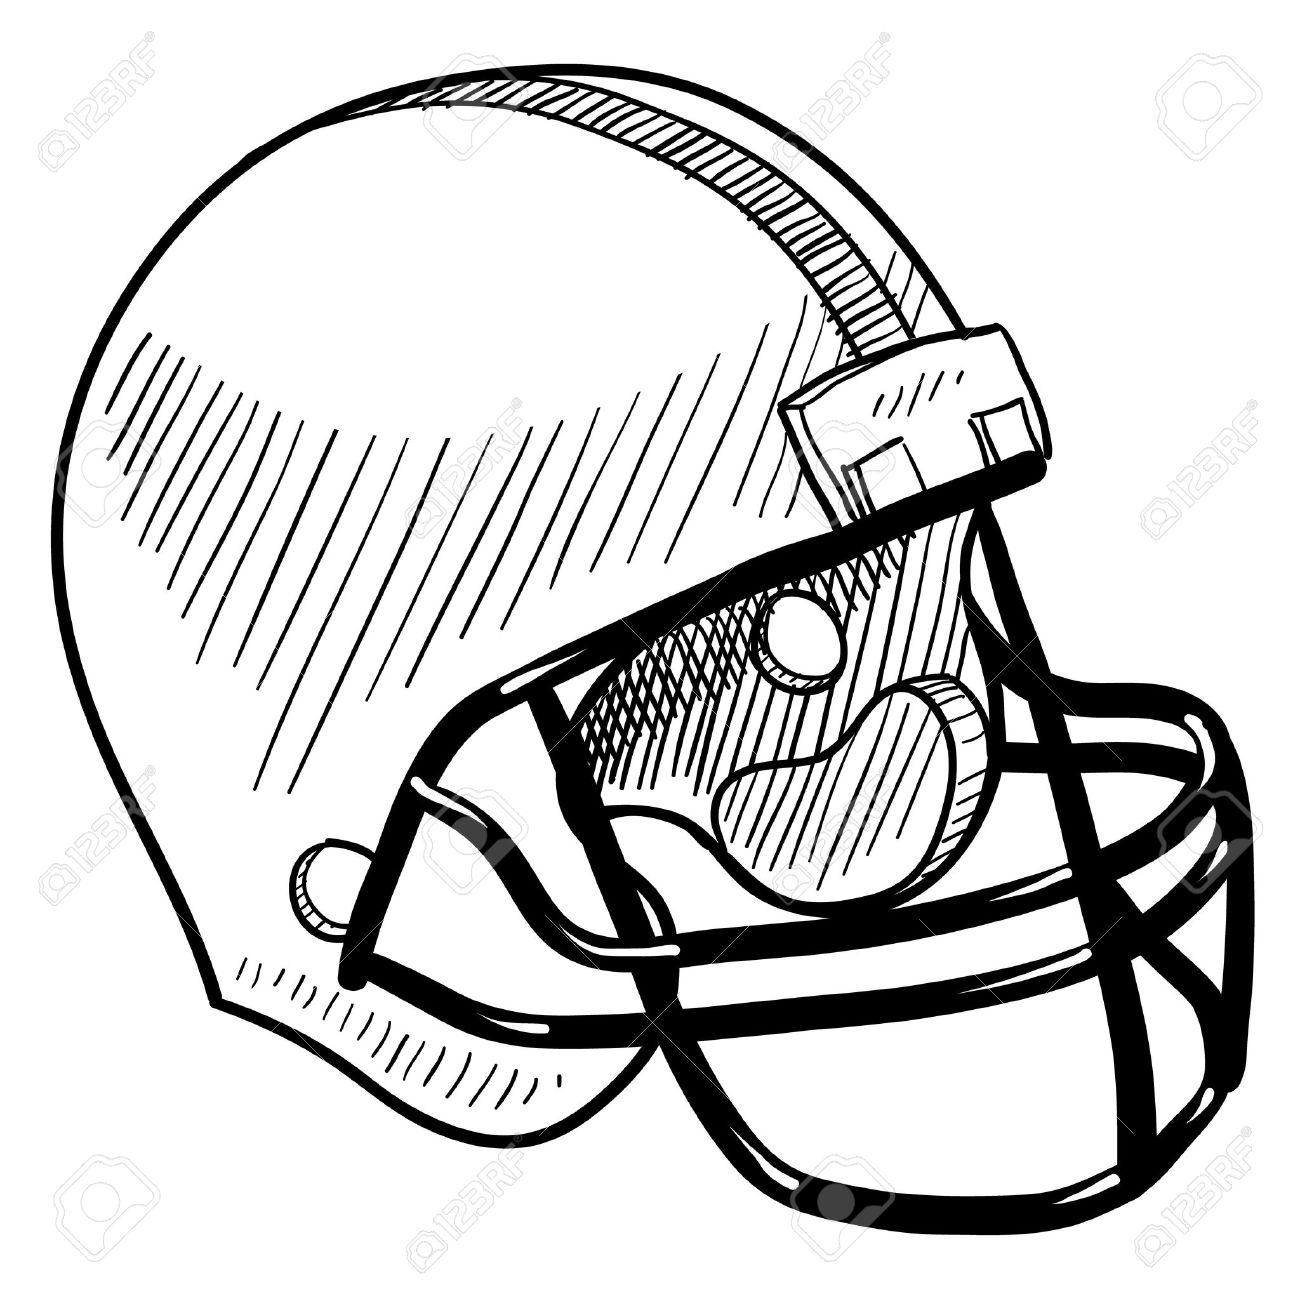 1300x1300 Vintage Football Helmet Clipart